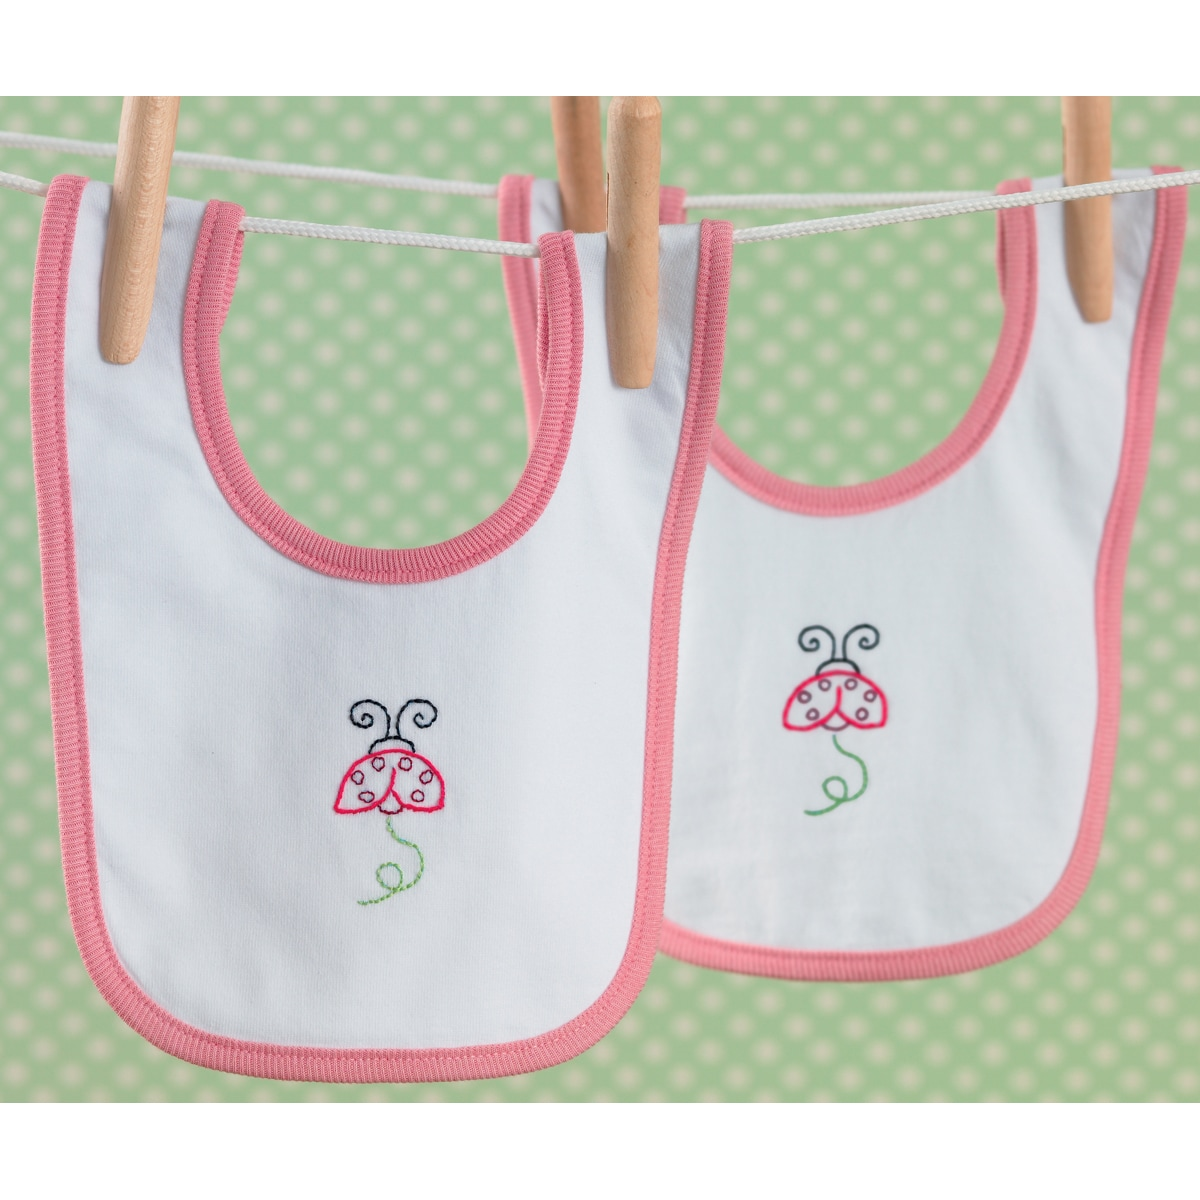 Martha Stewart Baby Bib Pair Stamped Embroidery Kit